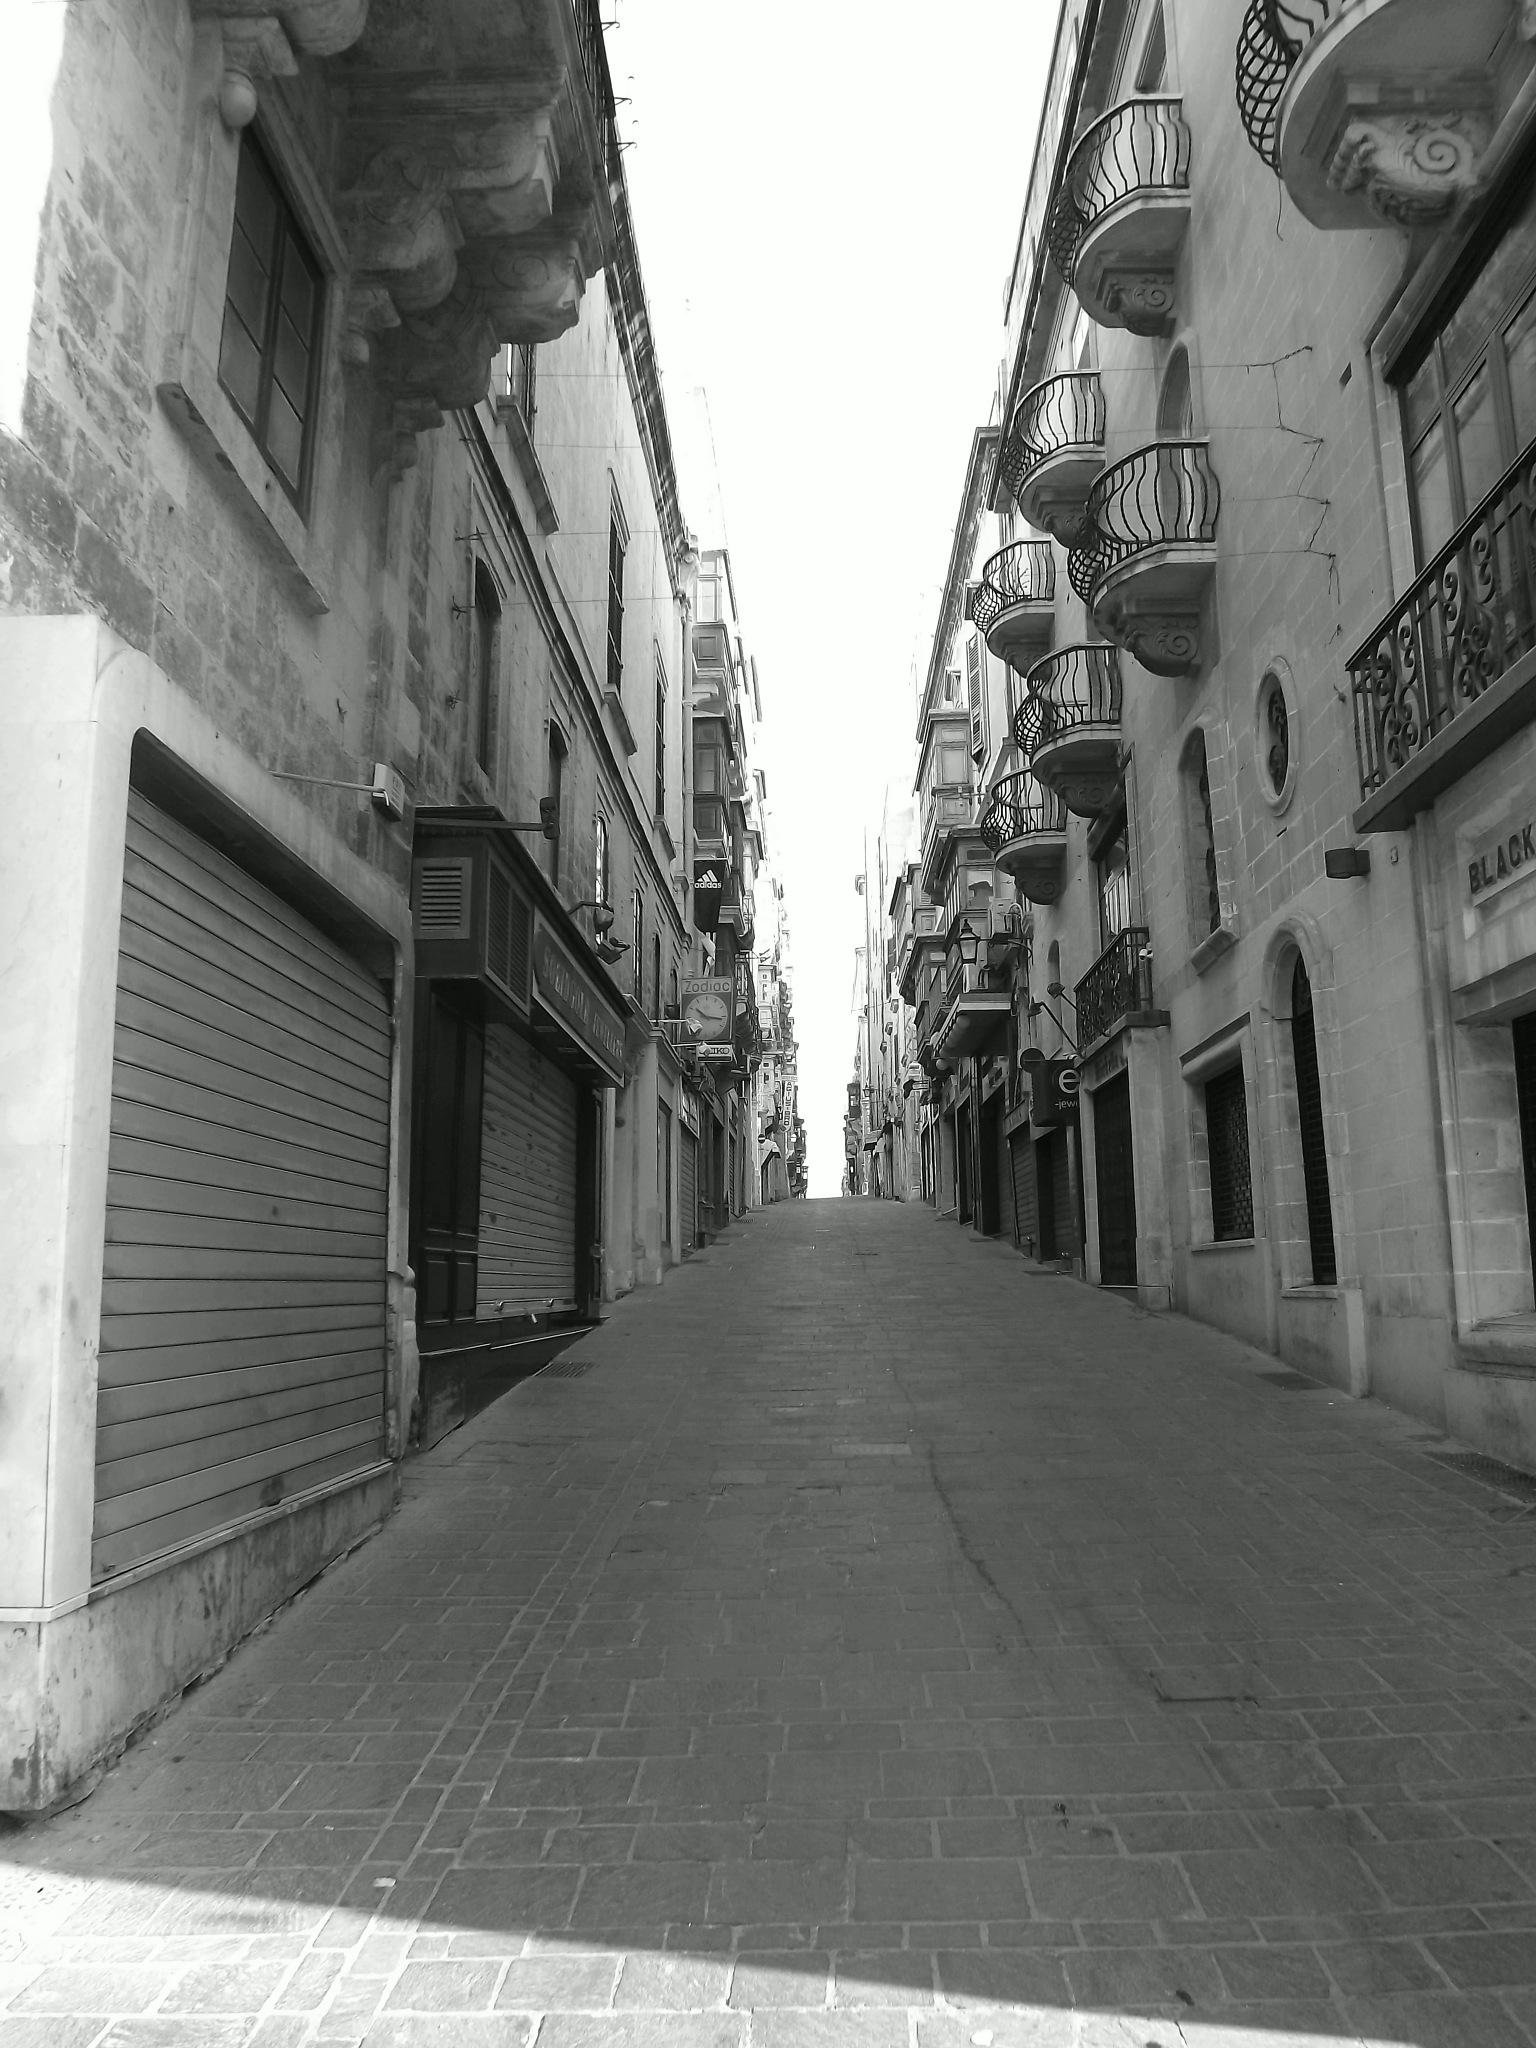 Sun shines on an empty street by Jorge Giro